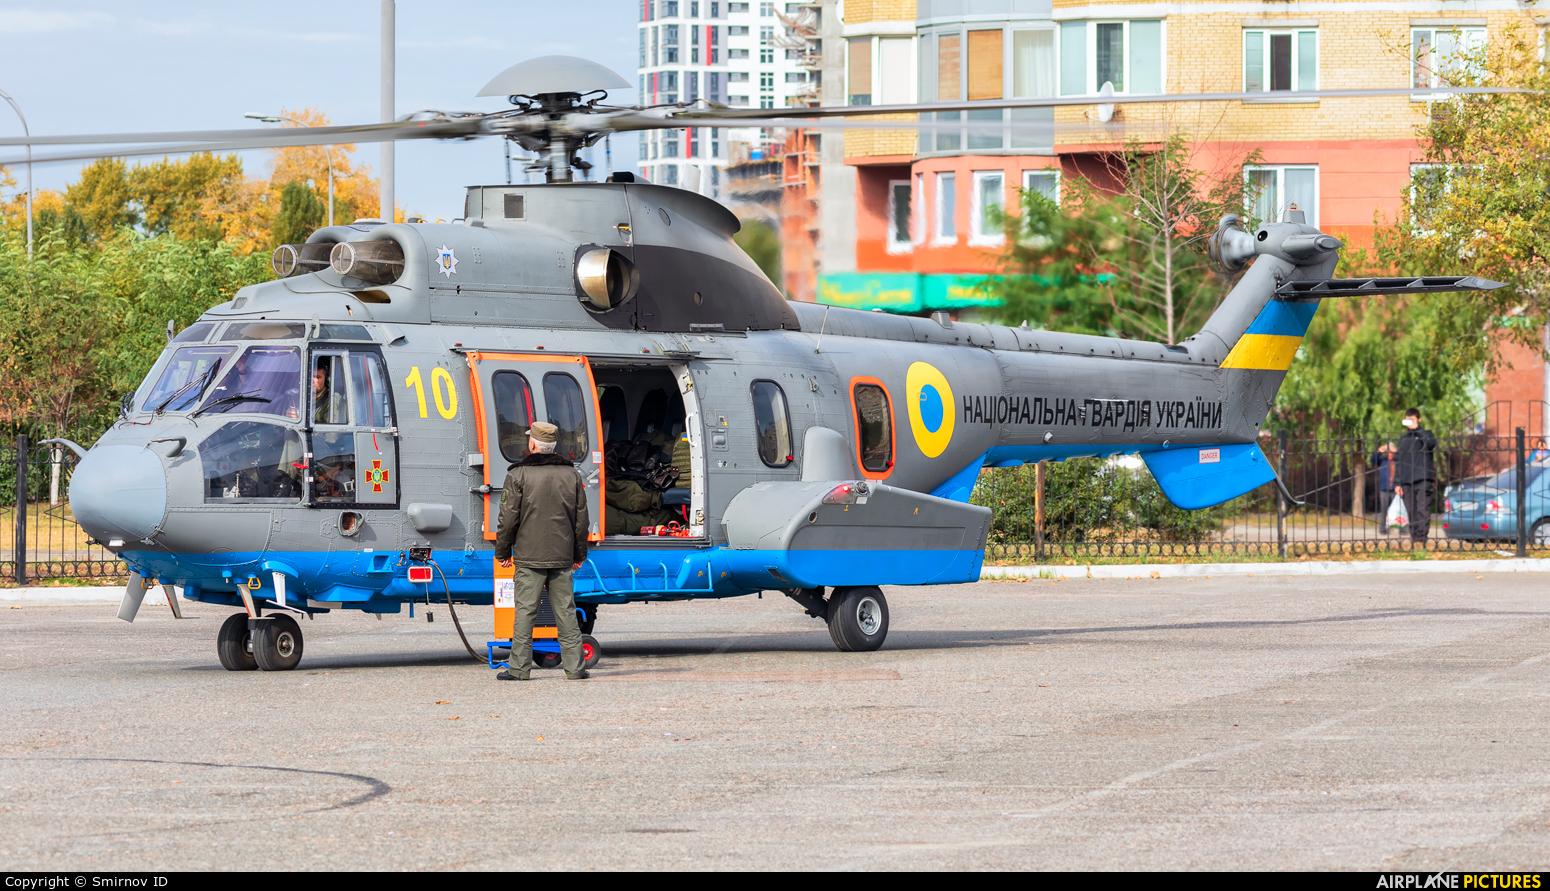 Ukraine - National Guard 10 YELLOW aircraft at Off Airport - Ukraine